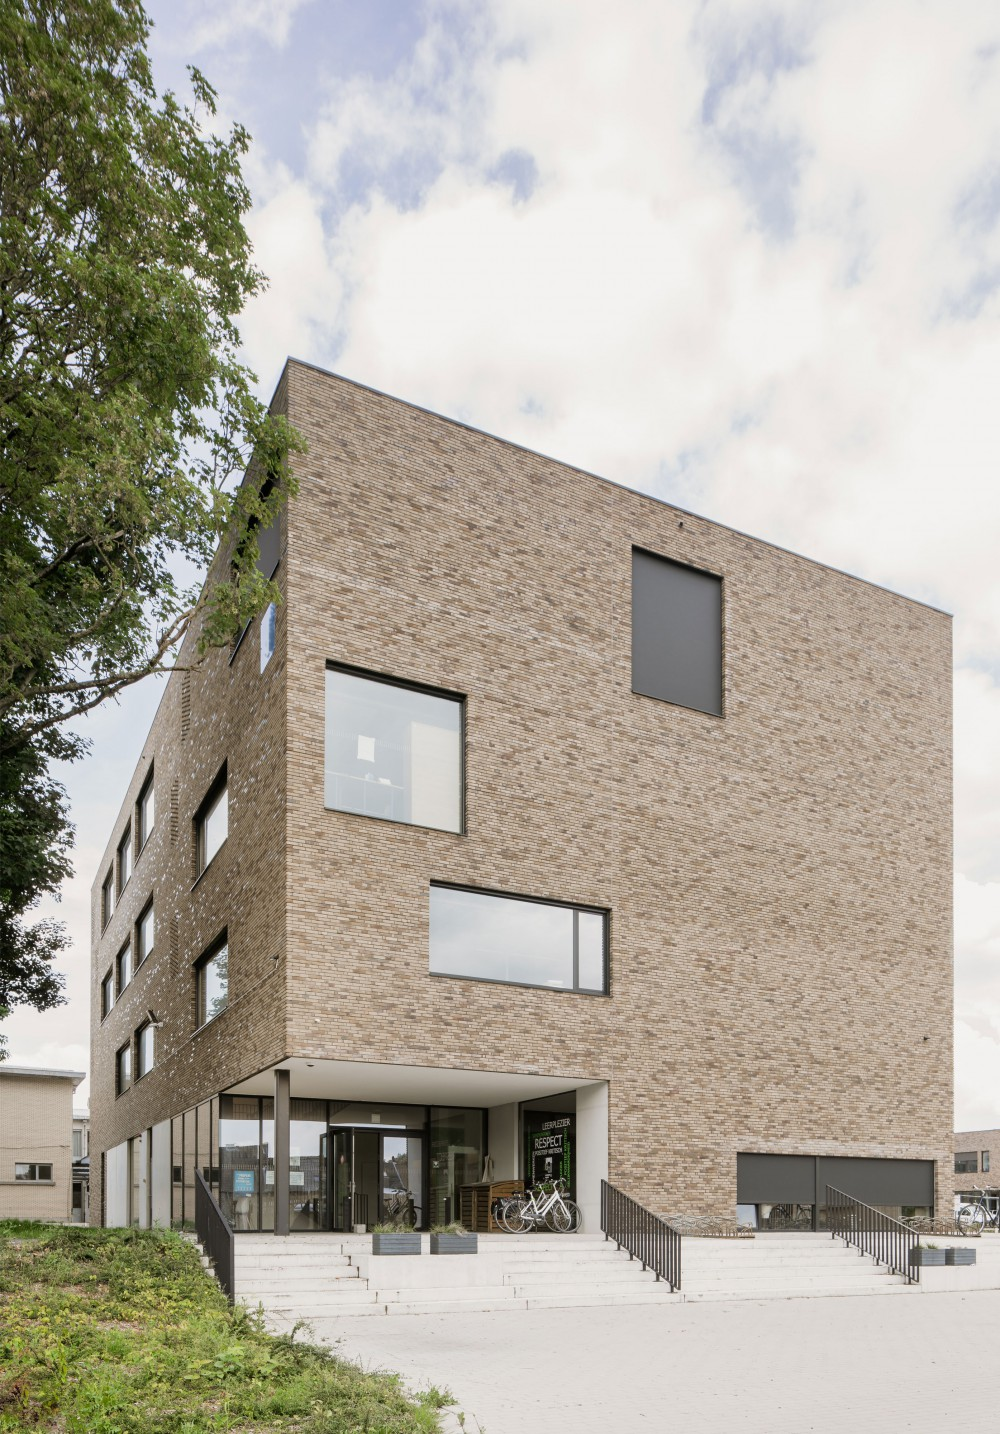 Abscis Architecten - atheneum: detached volume - photo Jeroen Verrecht